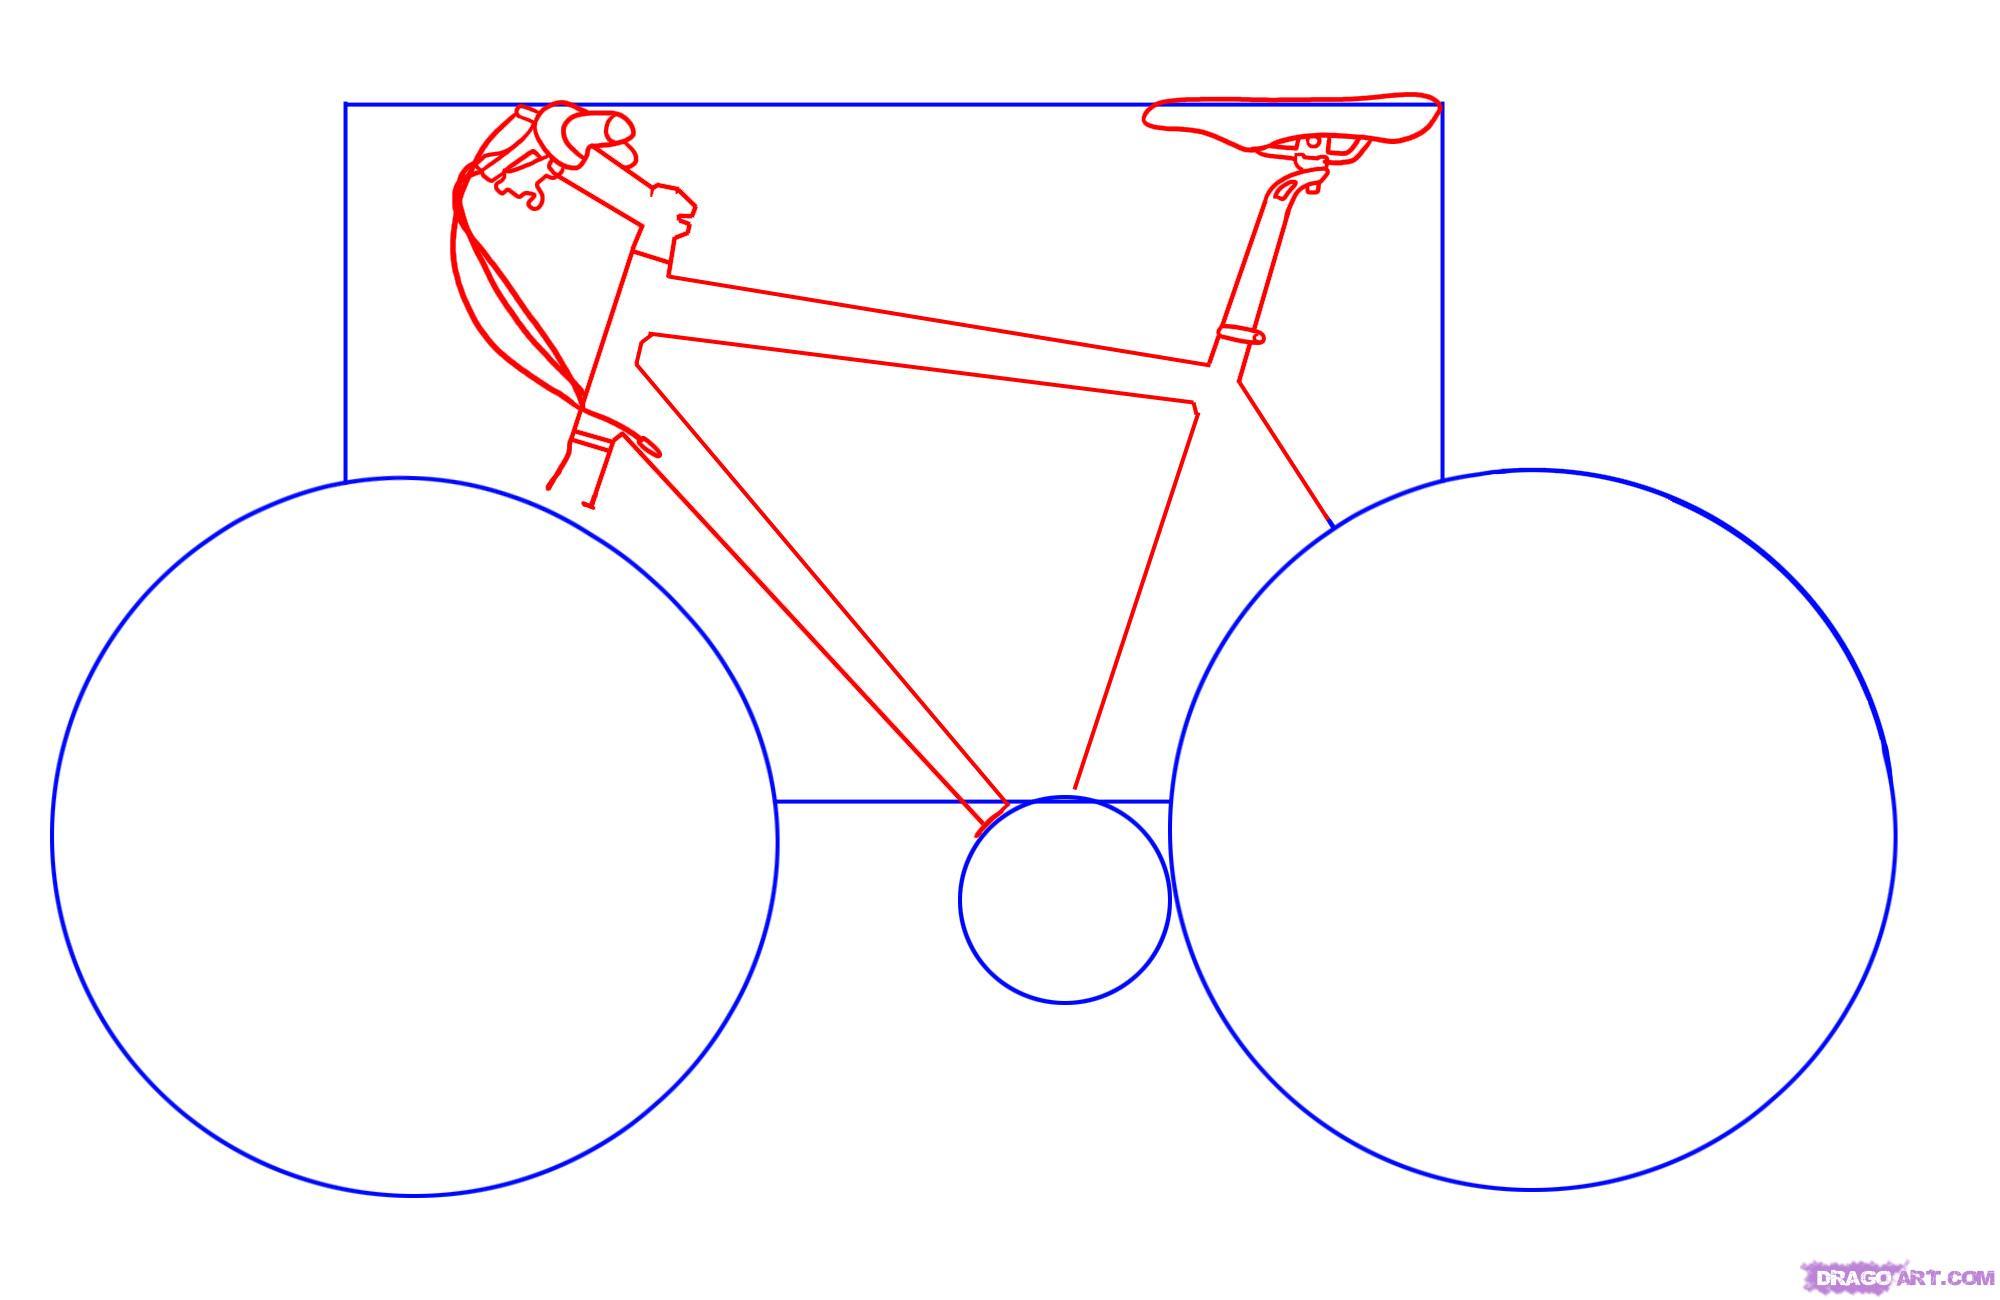 картинки велосипедиста карандашом поэтапно лондоне